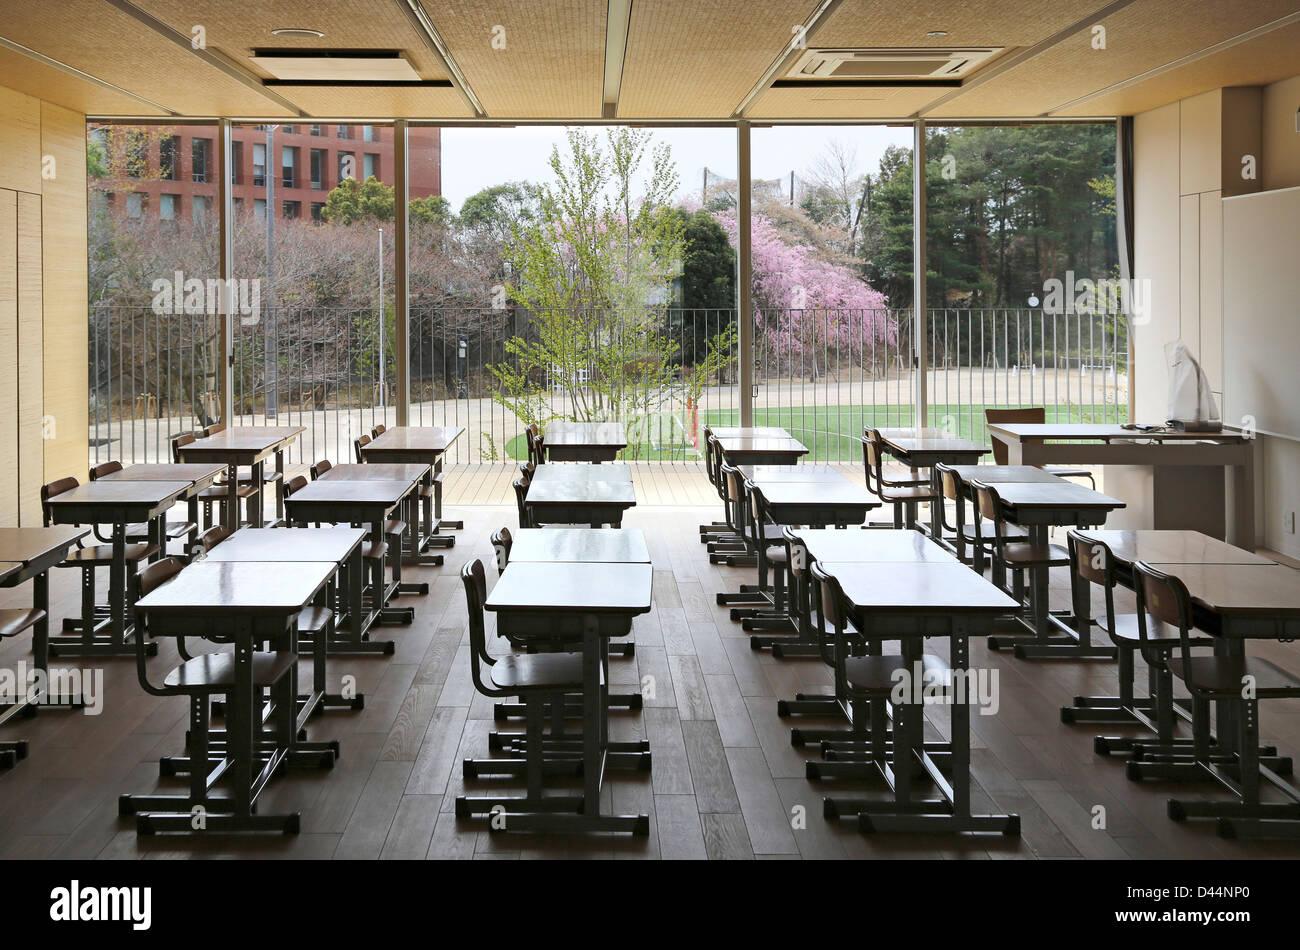 Teikyo University Elementary School Tokyo Japan Architect Kengo Kuma 2012 Interior View Typical Classroom On Ground Floor